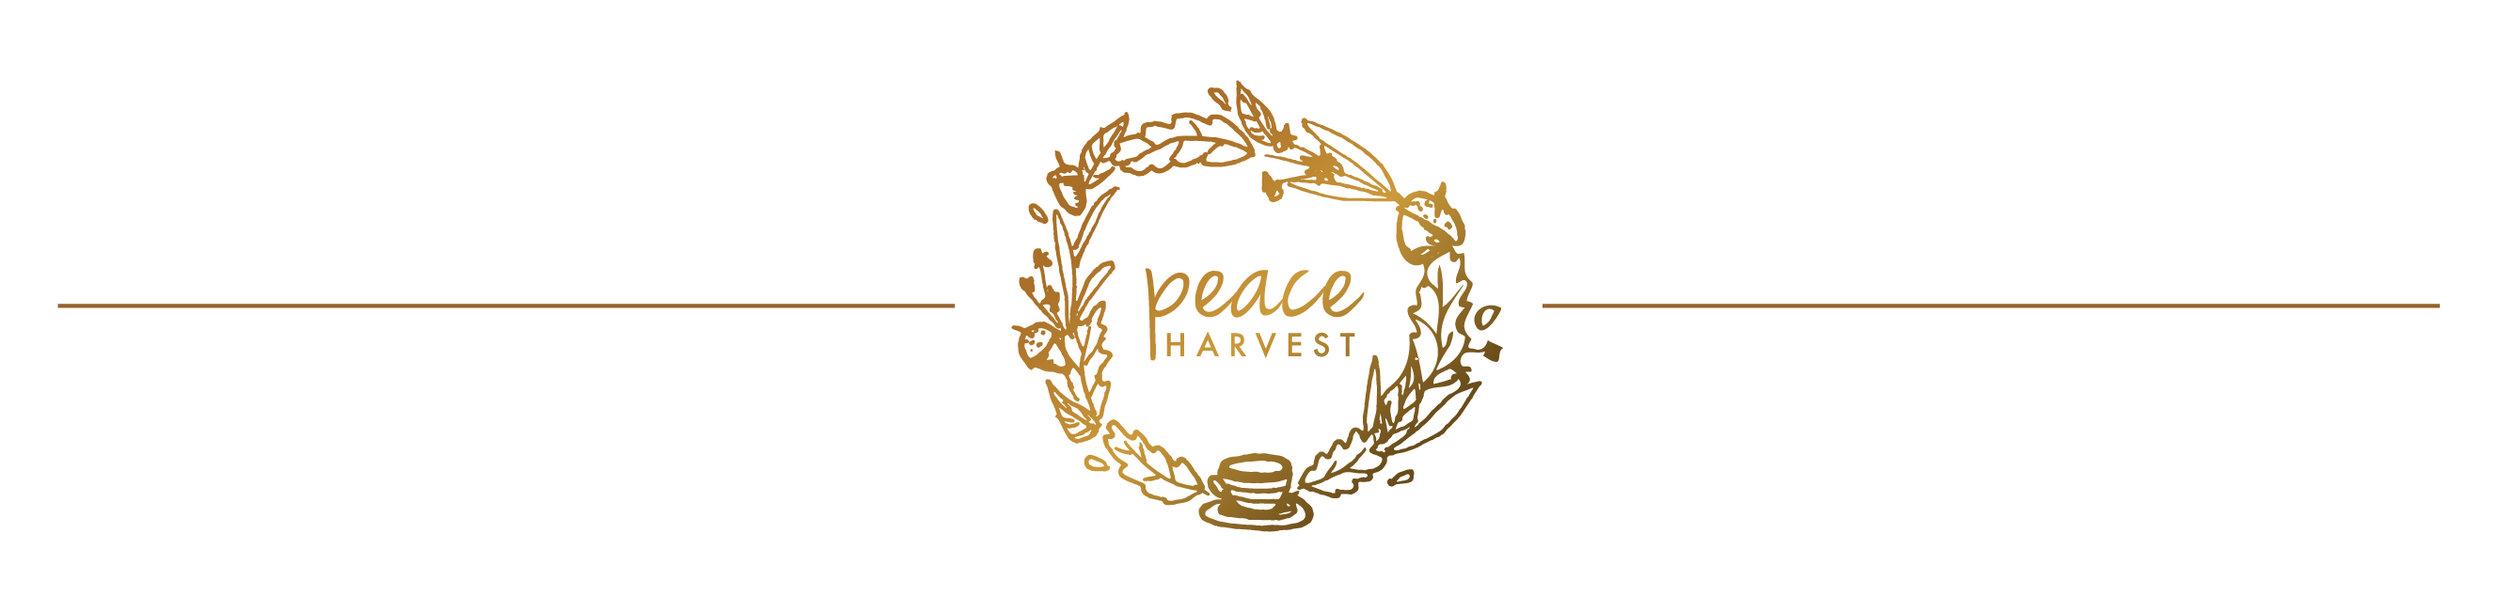 peace harvest retreat